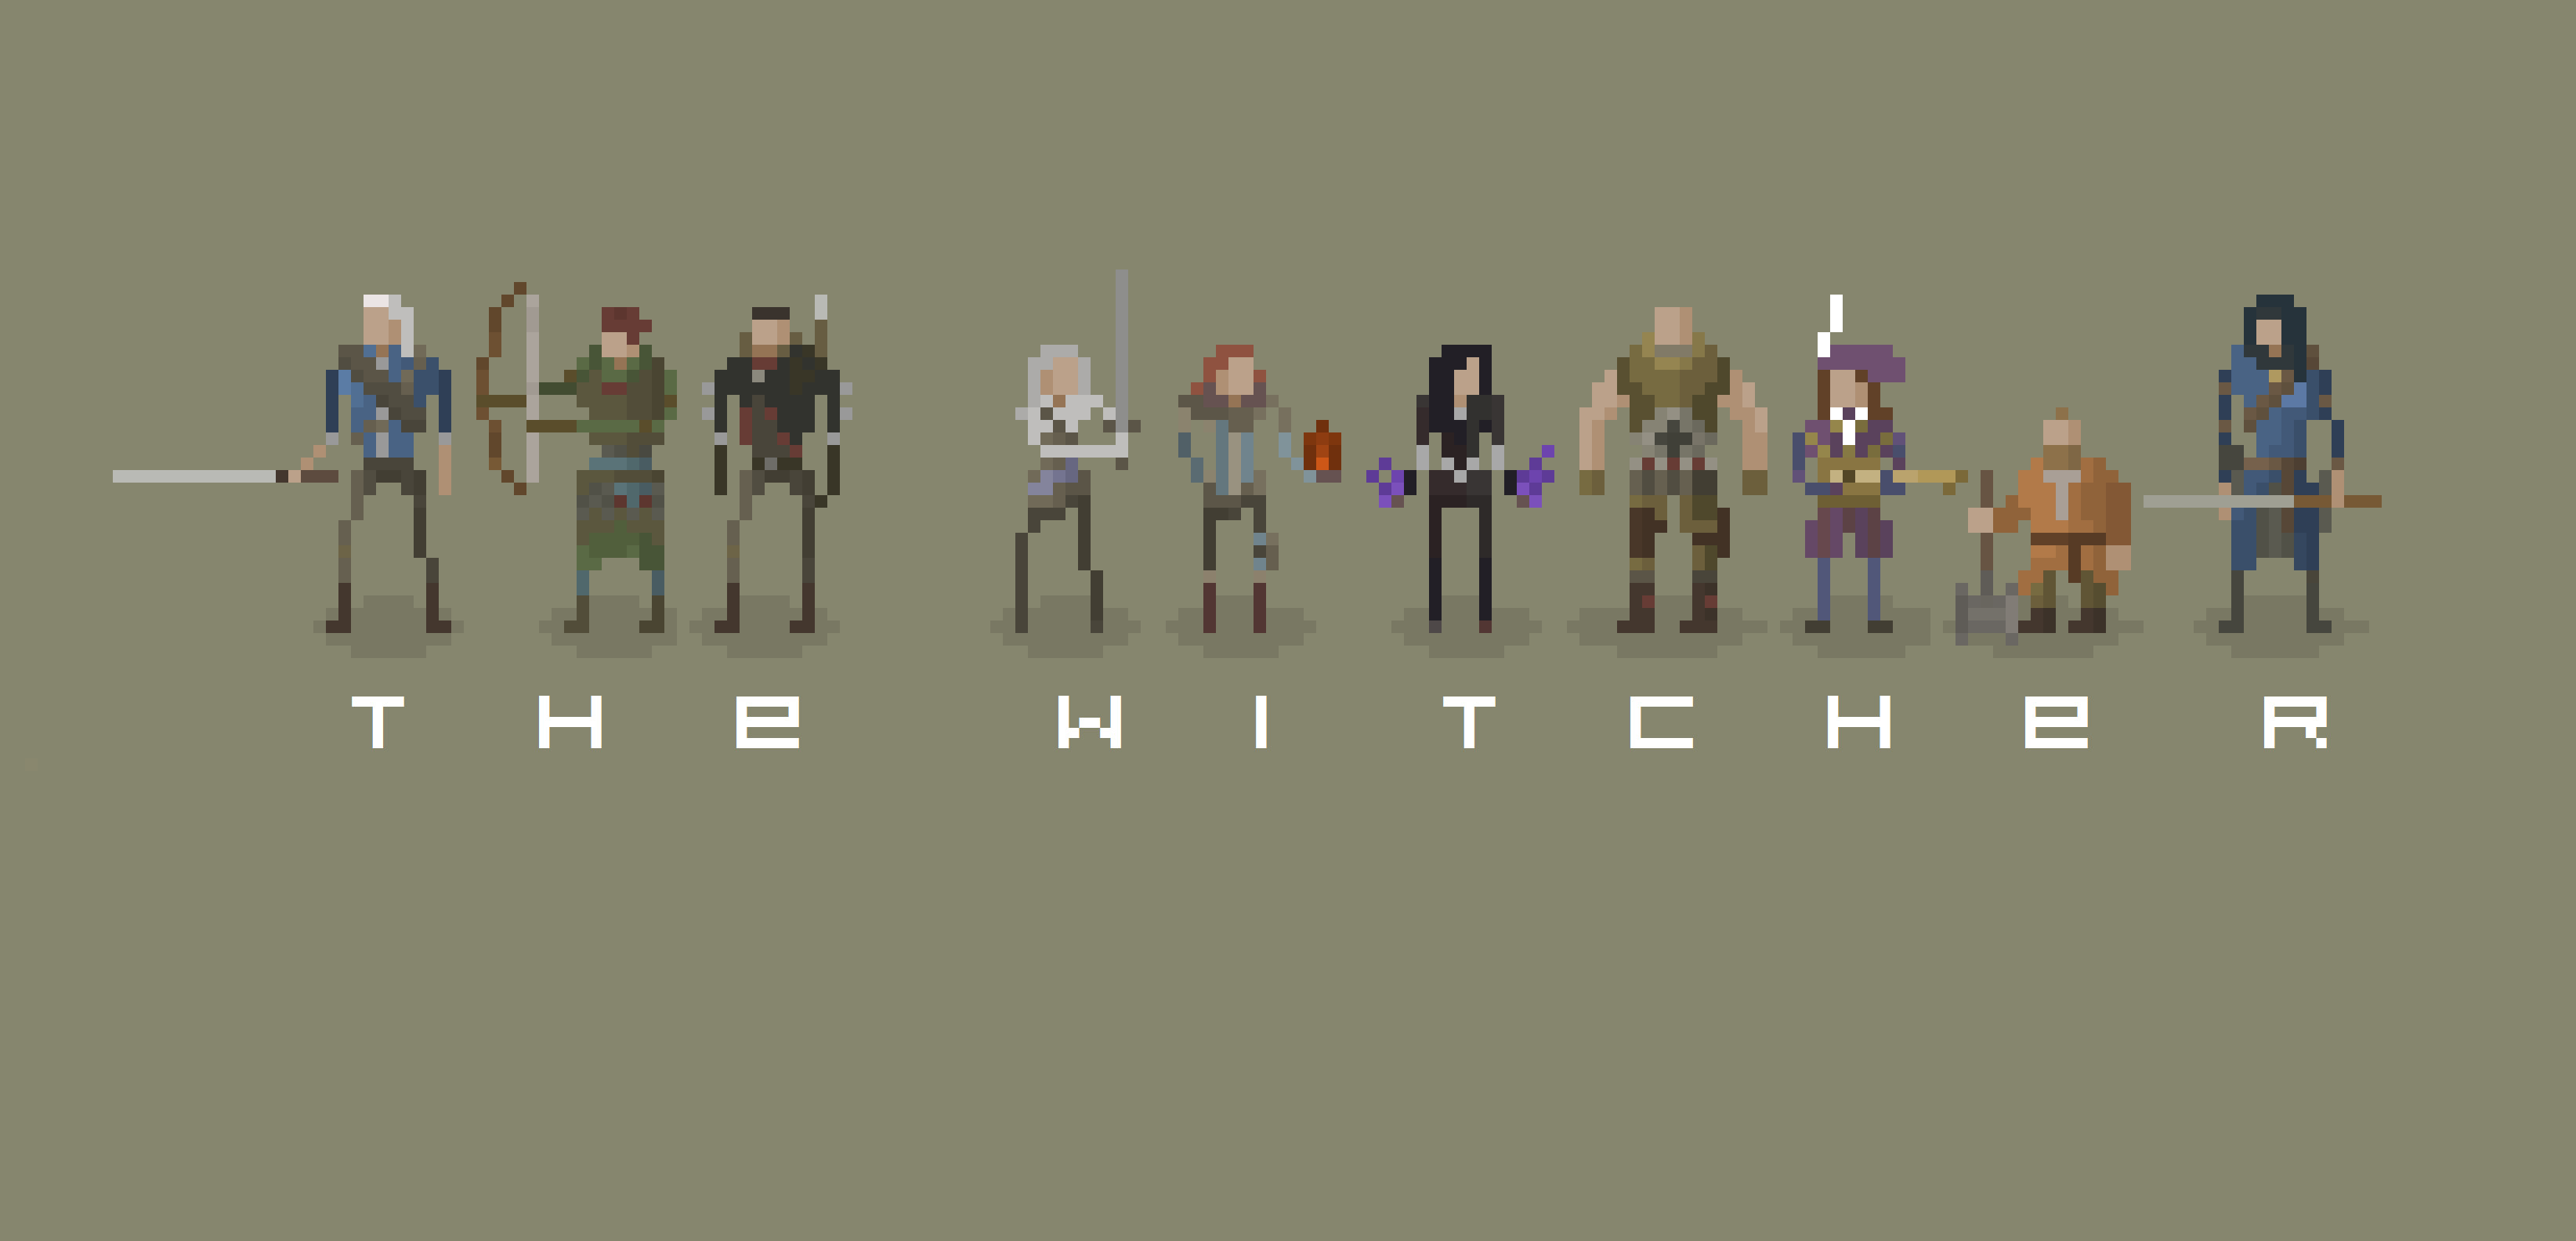 Character Design Pixel Art : Witcher characters pixel art by stagbit on deviantart